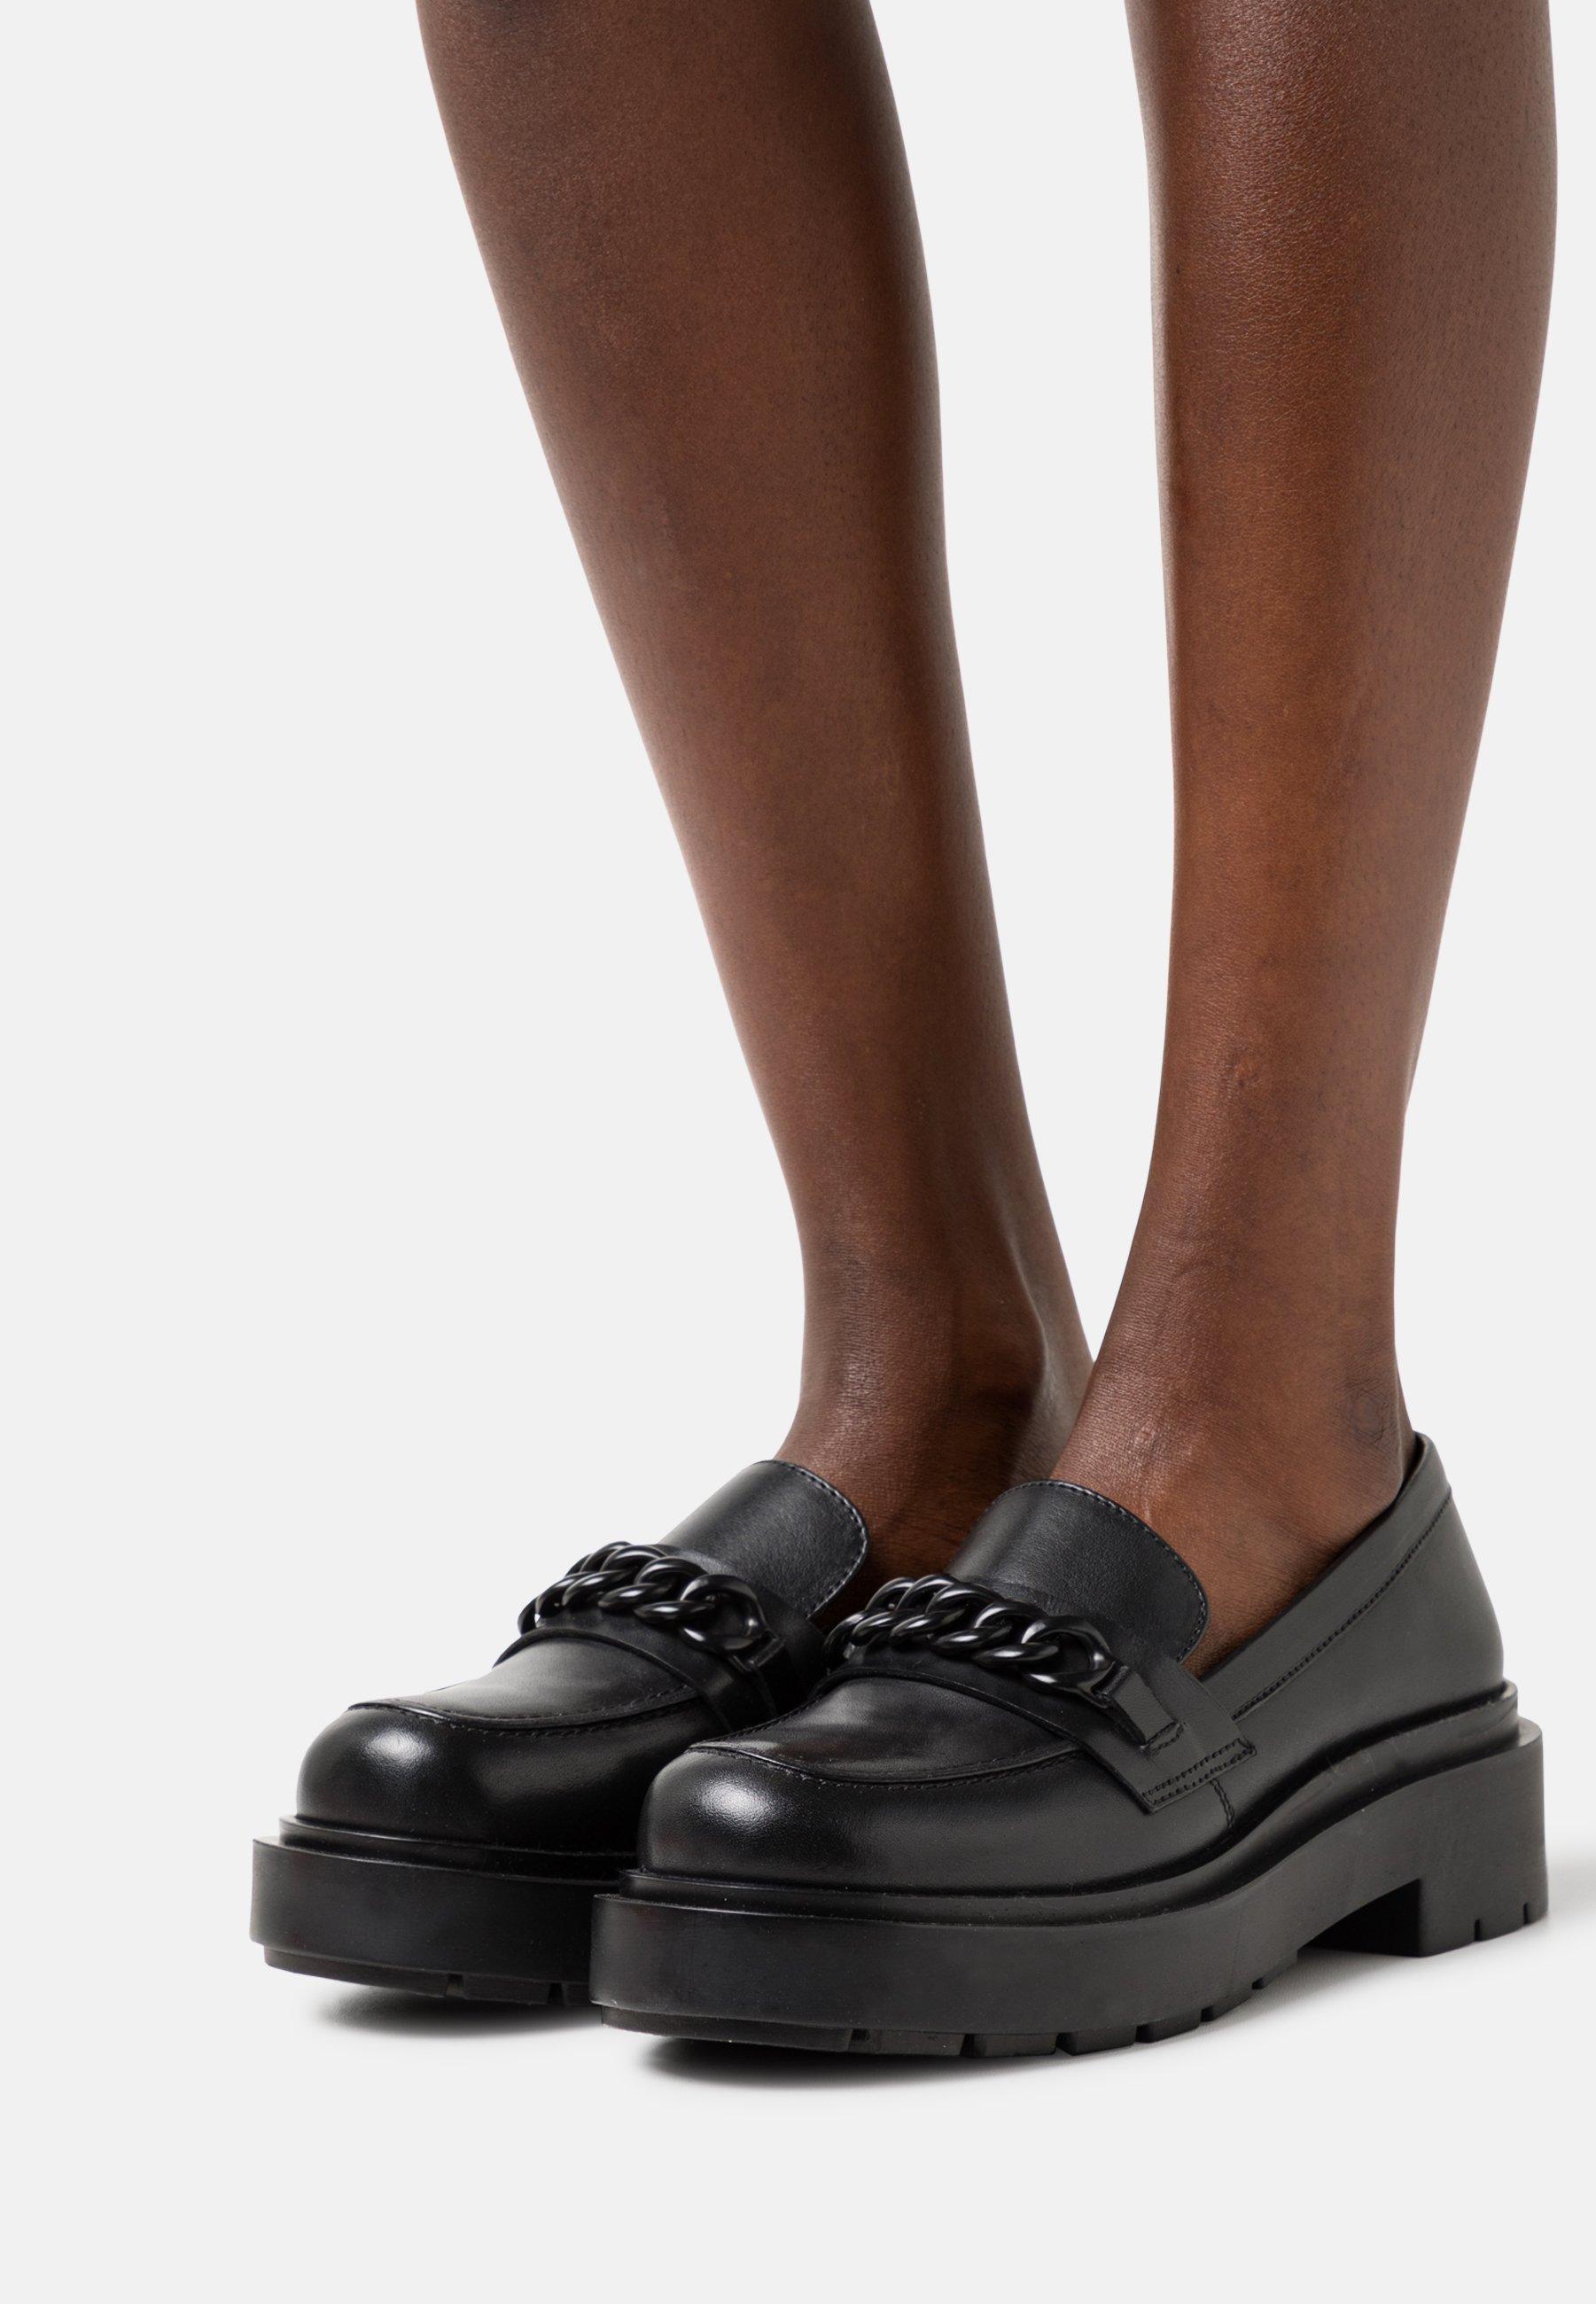 Women LEATHER - Slip-ons - black